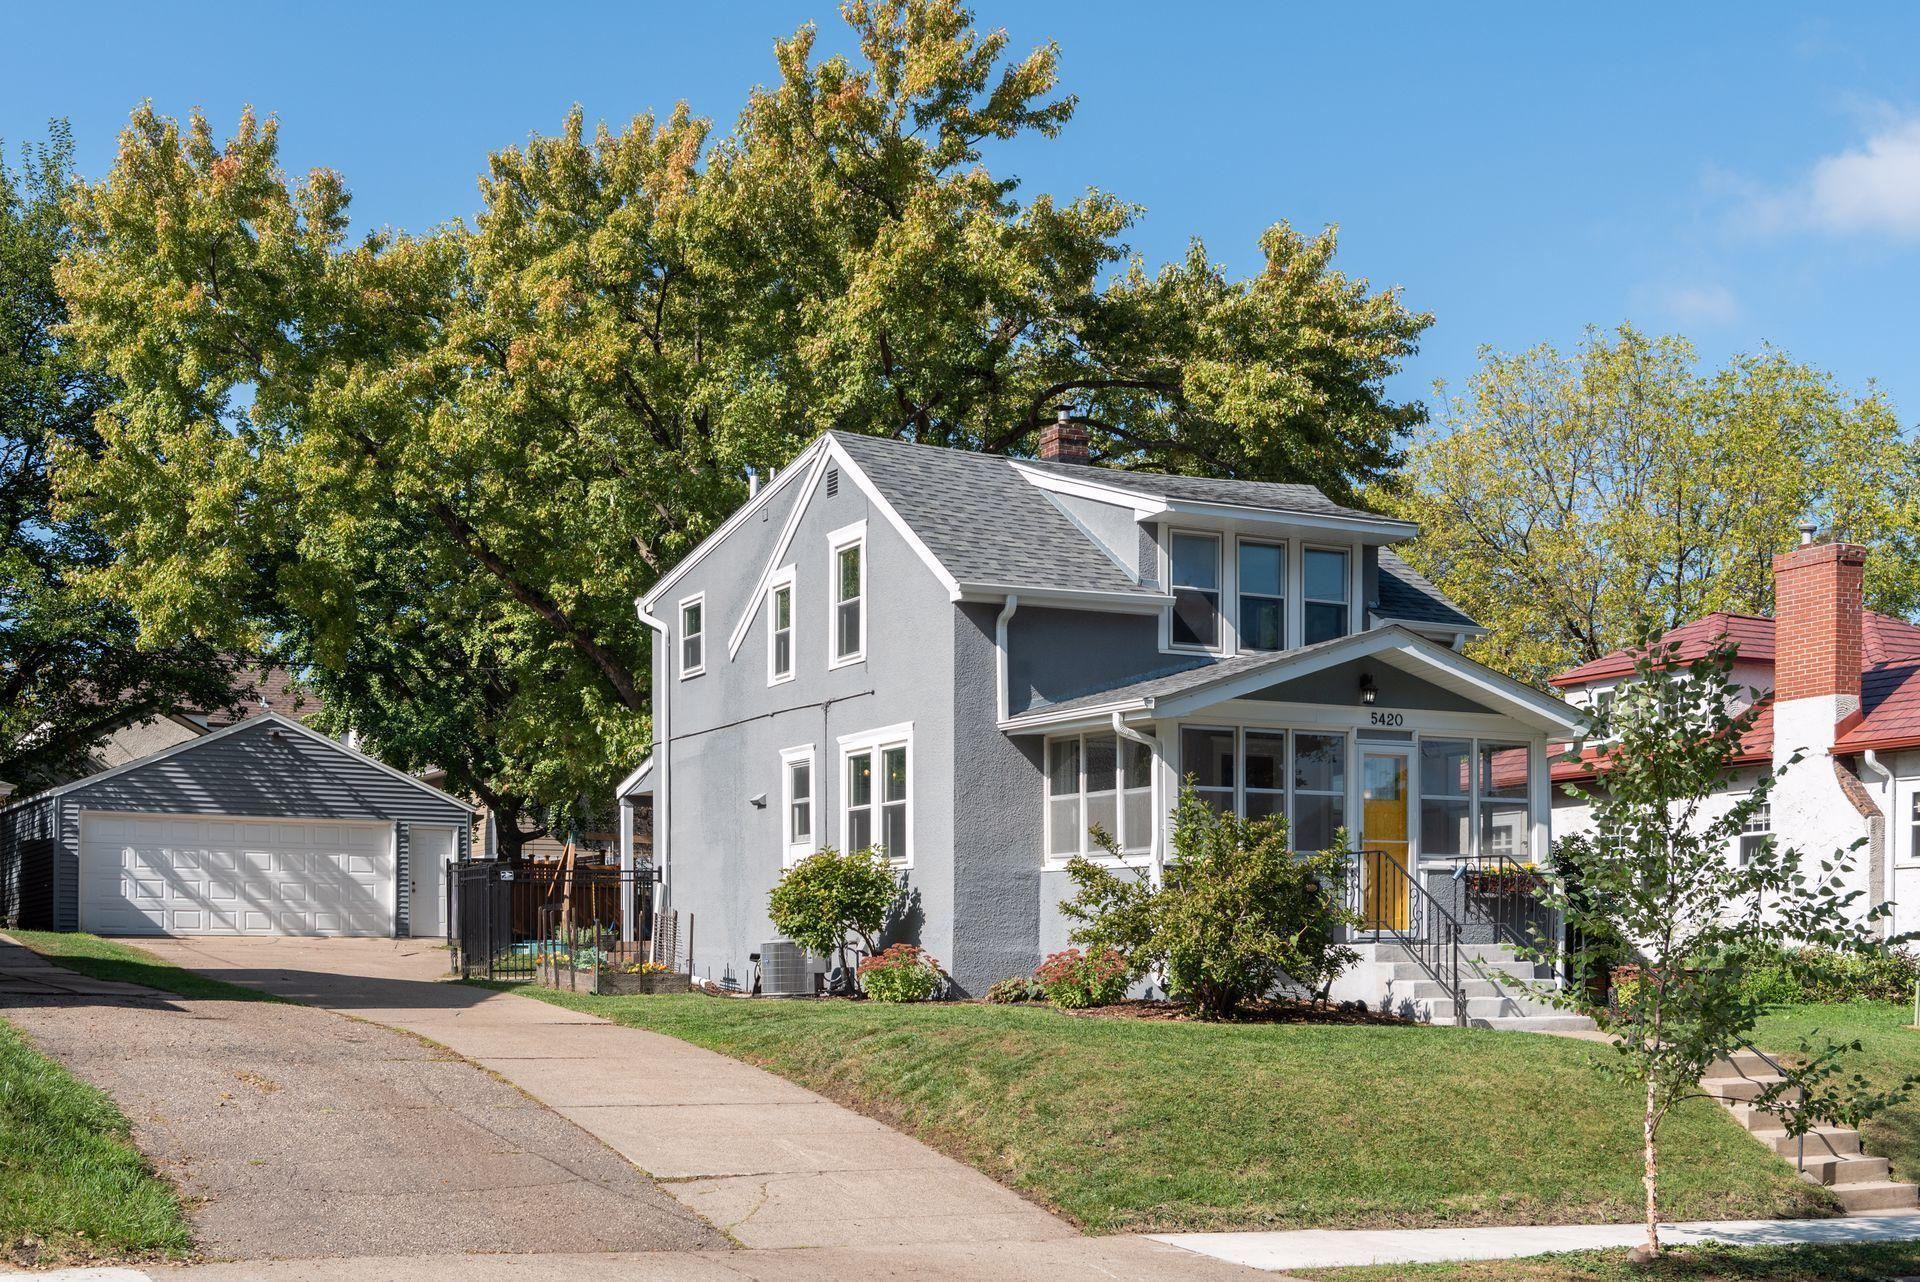 Photo of 5420 Wentworth Avenue, Minneapolis, MN 55419 (MLS # 6107643)